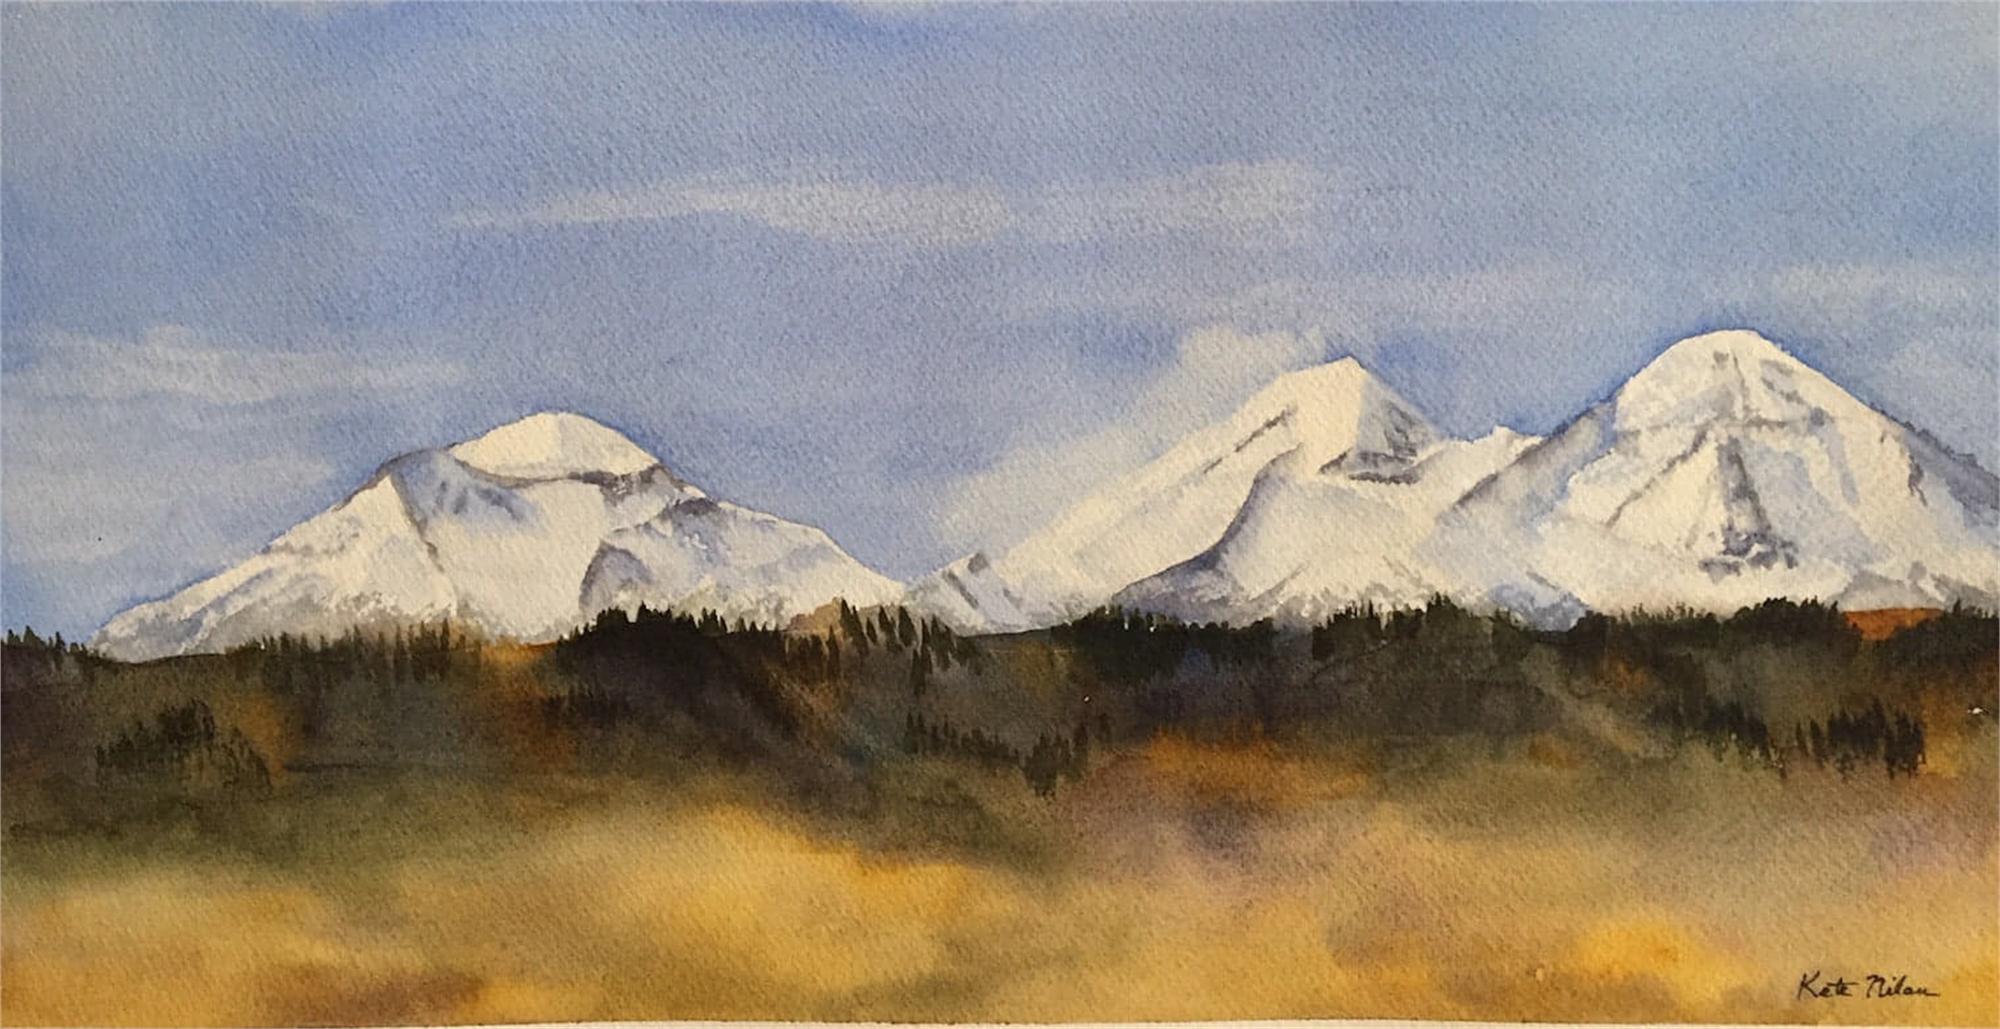 Sisters Three by Kate Nilan (Portland, OR)